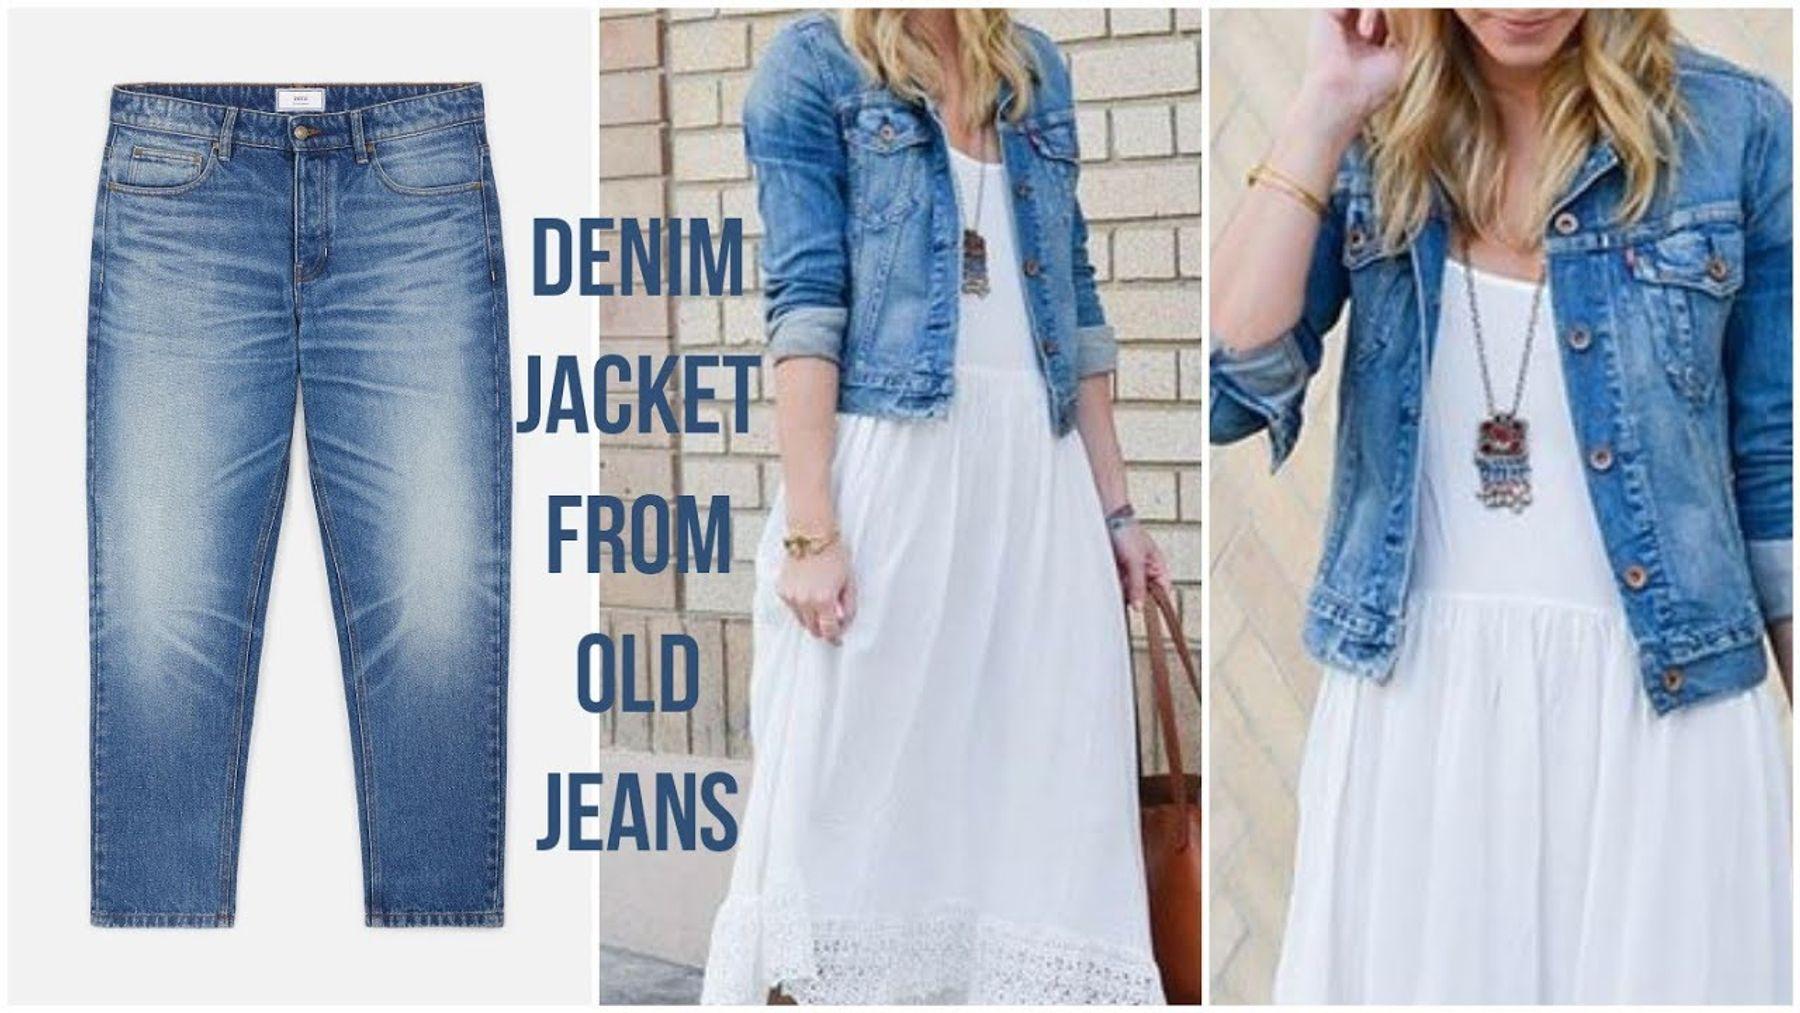 Tái chế quần jean thành áo khoác jean